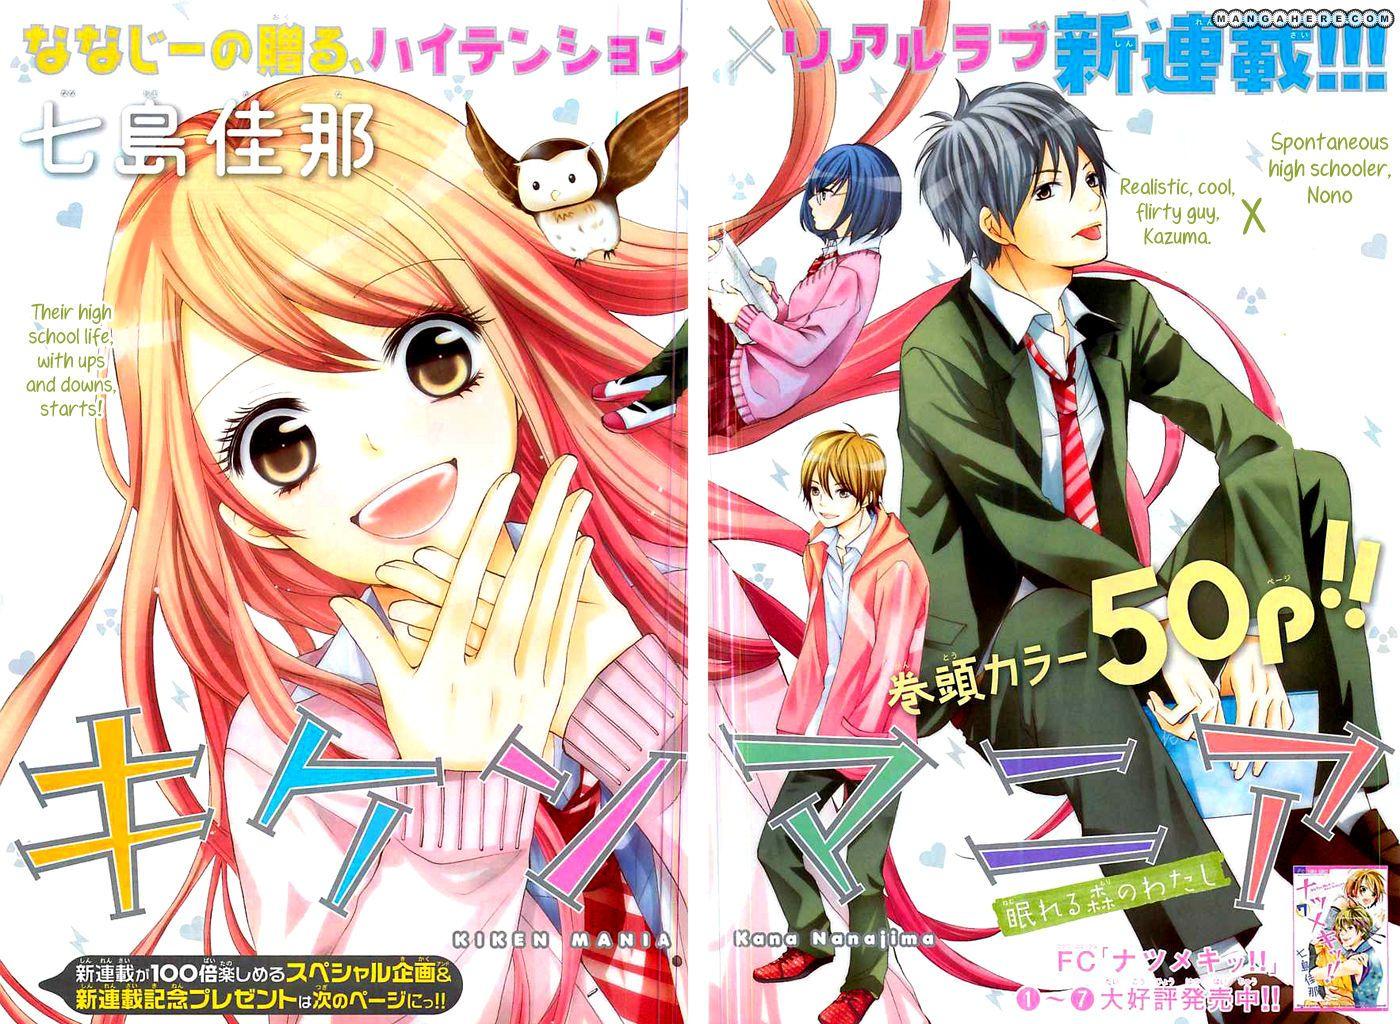 Kiken Mania manga shoujo romantic Shoujo & Josei 2